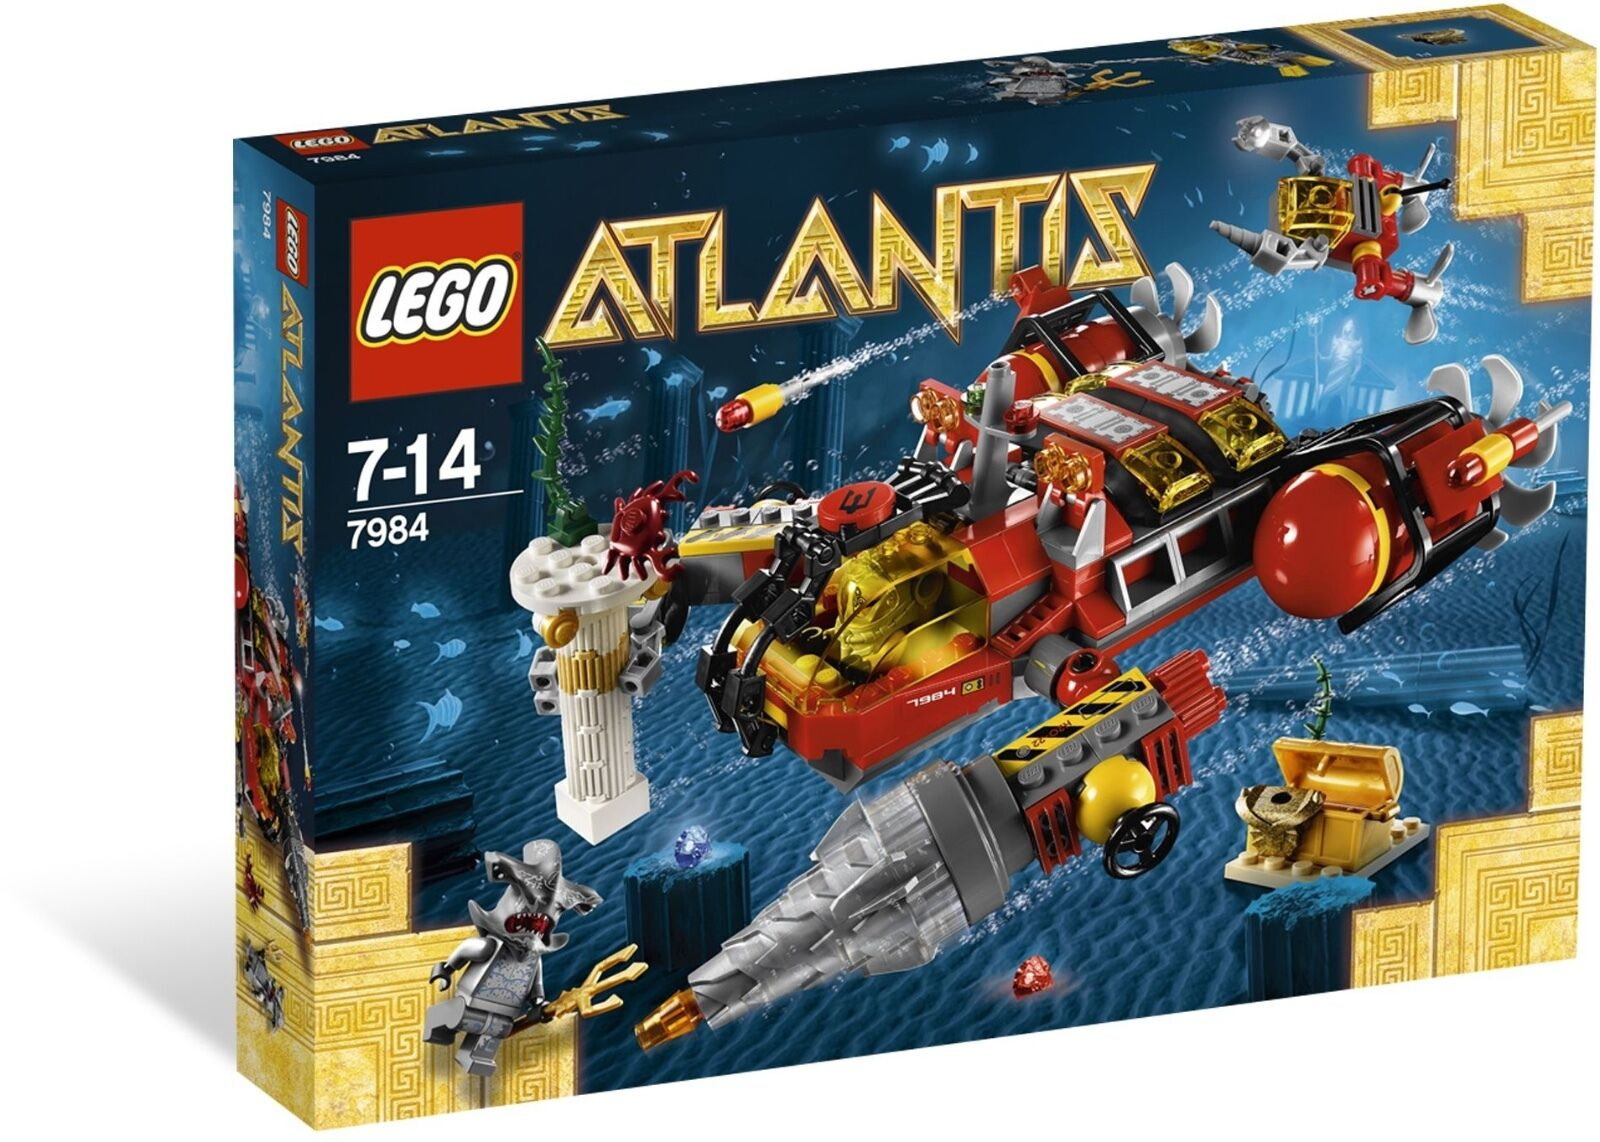 LEGO ® ATLANTIS  7984 foratura-U-avvio NUOVO OVP _ Deep Sea Raider nuovo MISB NRFB  consegna veloce